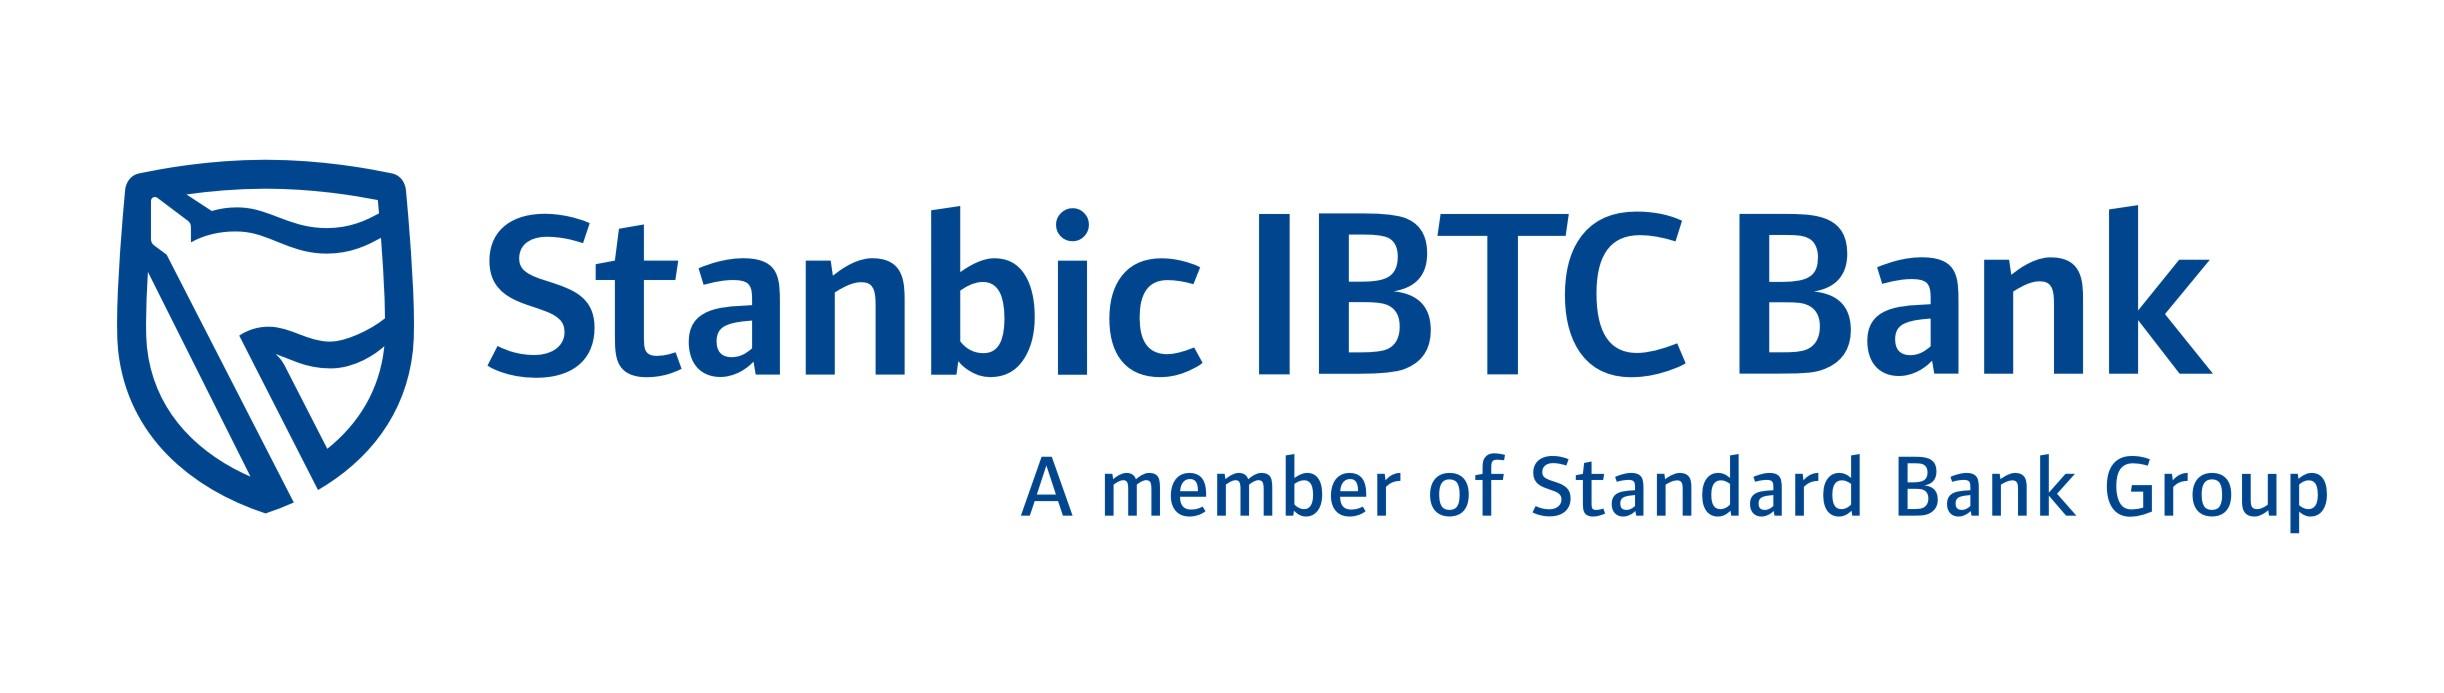 Stanbic IBTC Holdings posts N43.1bn after-tax profit